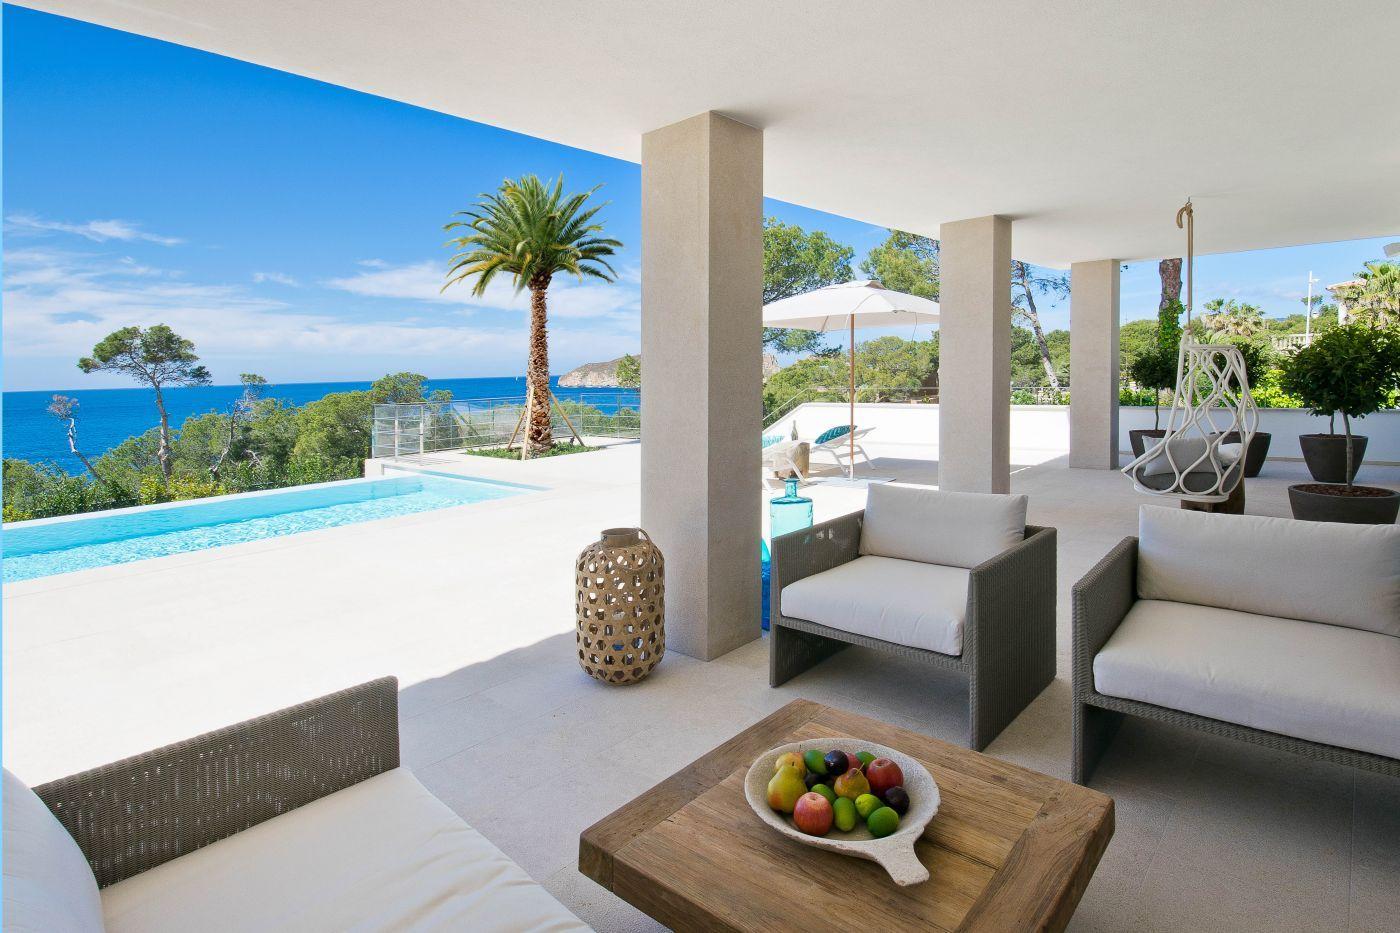 Apm Mallorca penyes rotges projekte apm mallorca architecture architektur